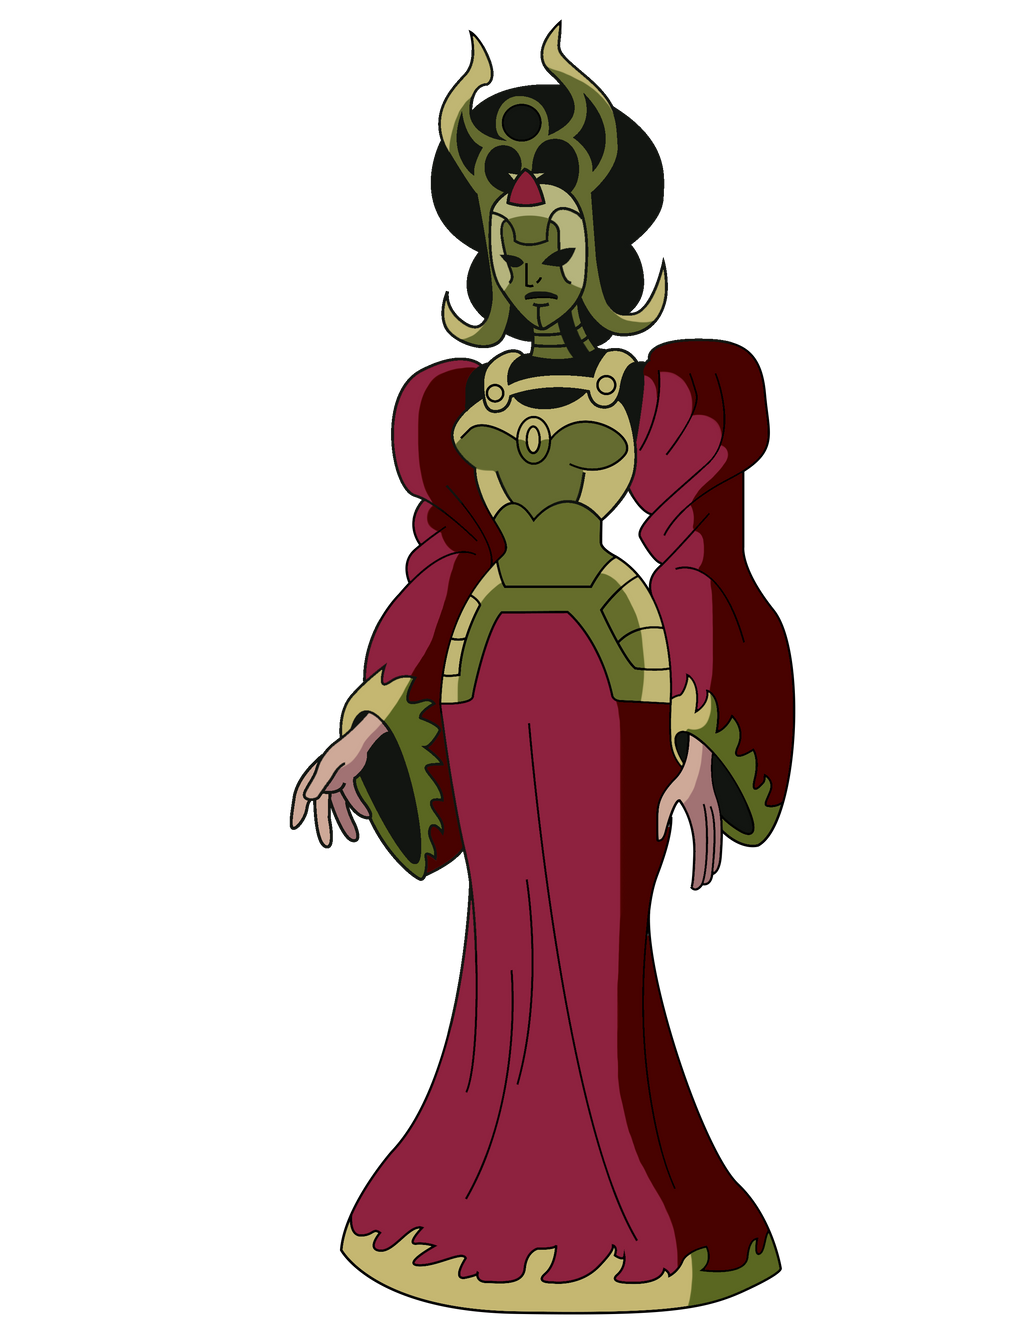 Morgaine Le Fay By Thomascasallas On Deviantart Comic Villains Justice League Villain Batman The Animated Series